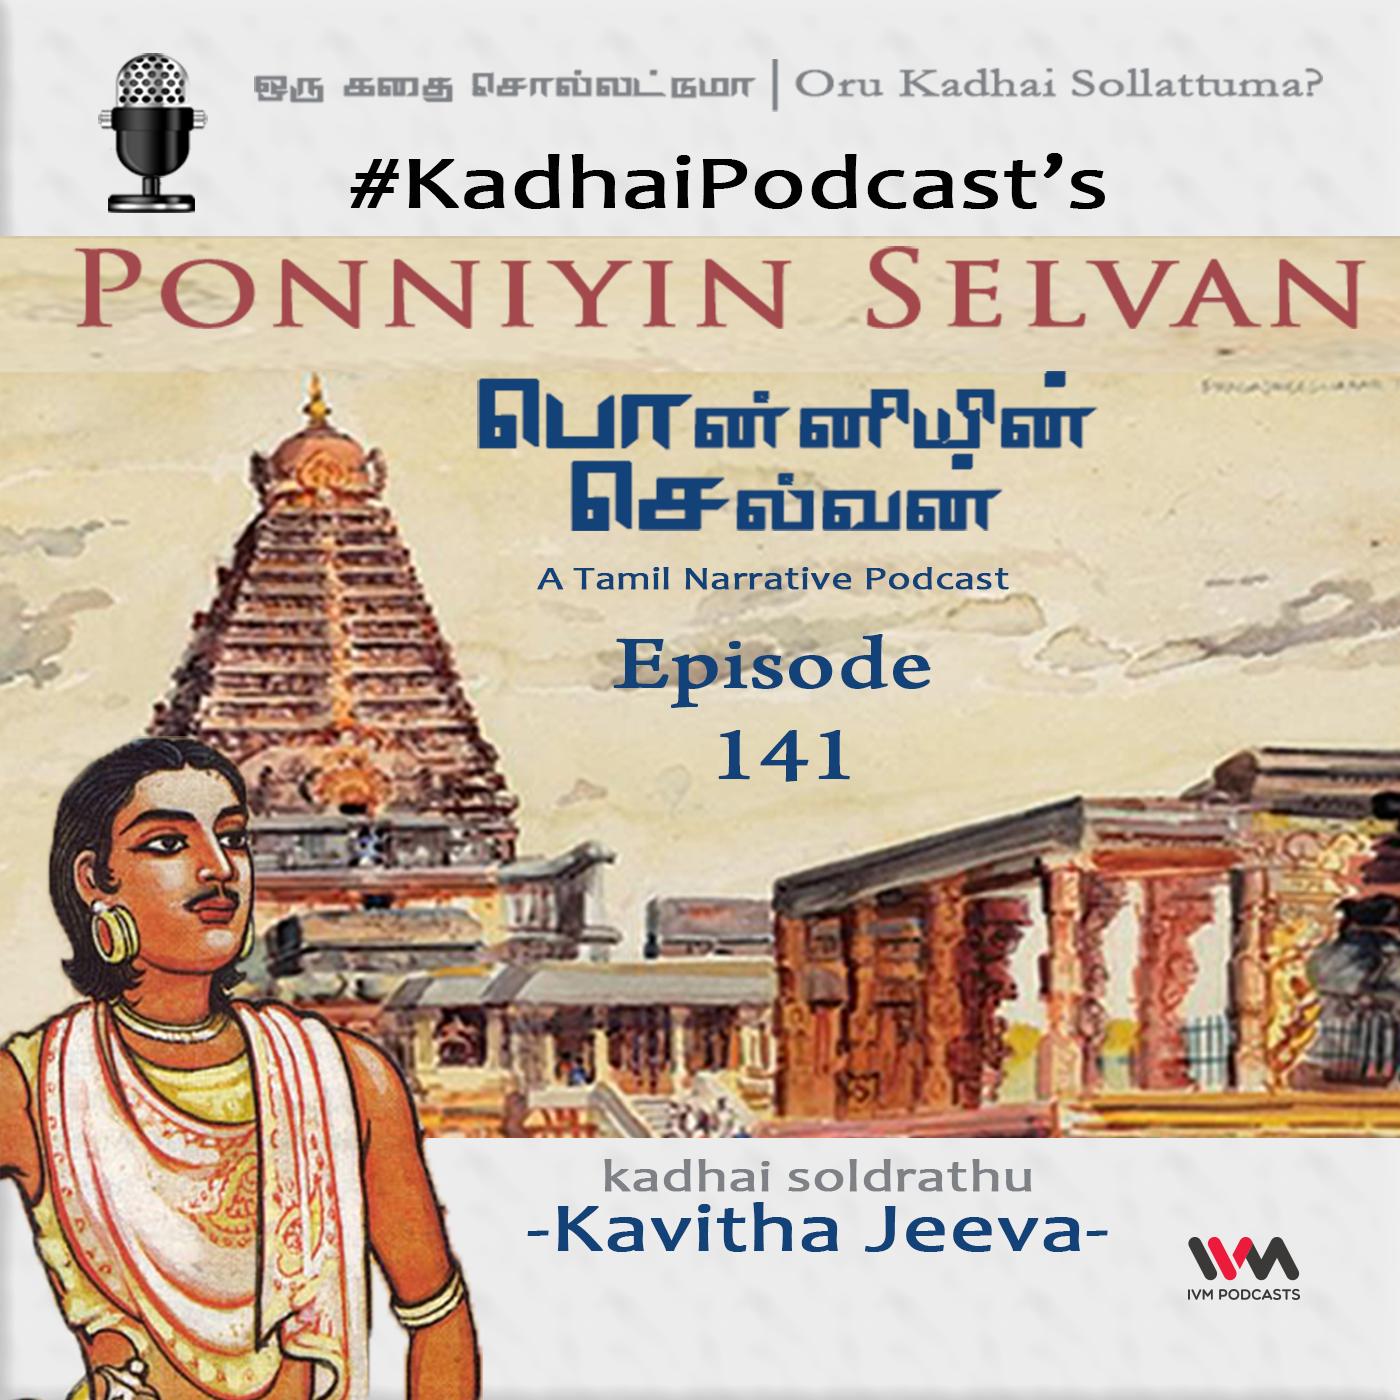 KadhaiPodcast's Ponniyin Selvan - Episode # 141